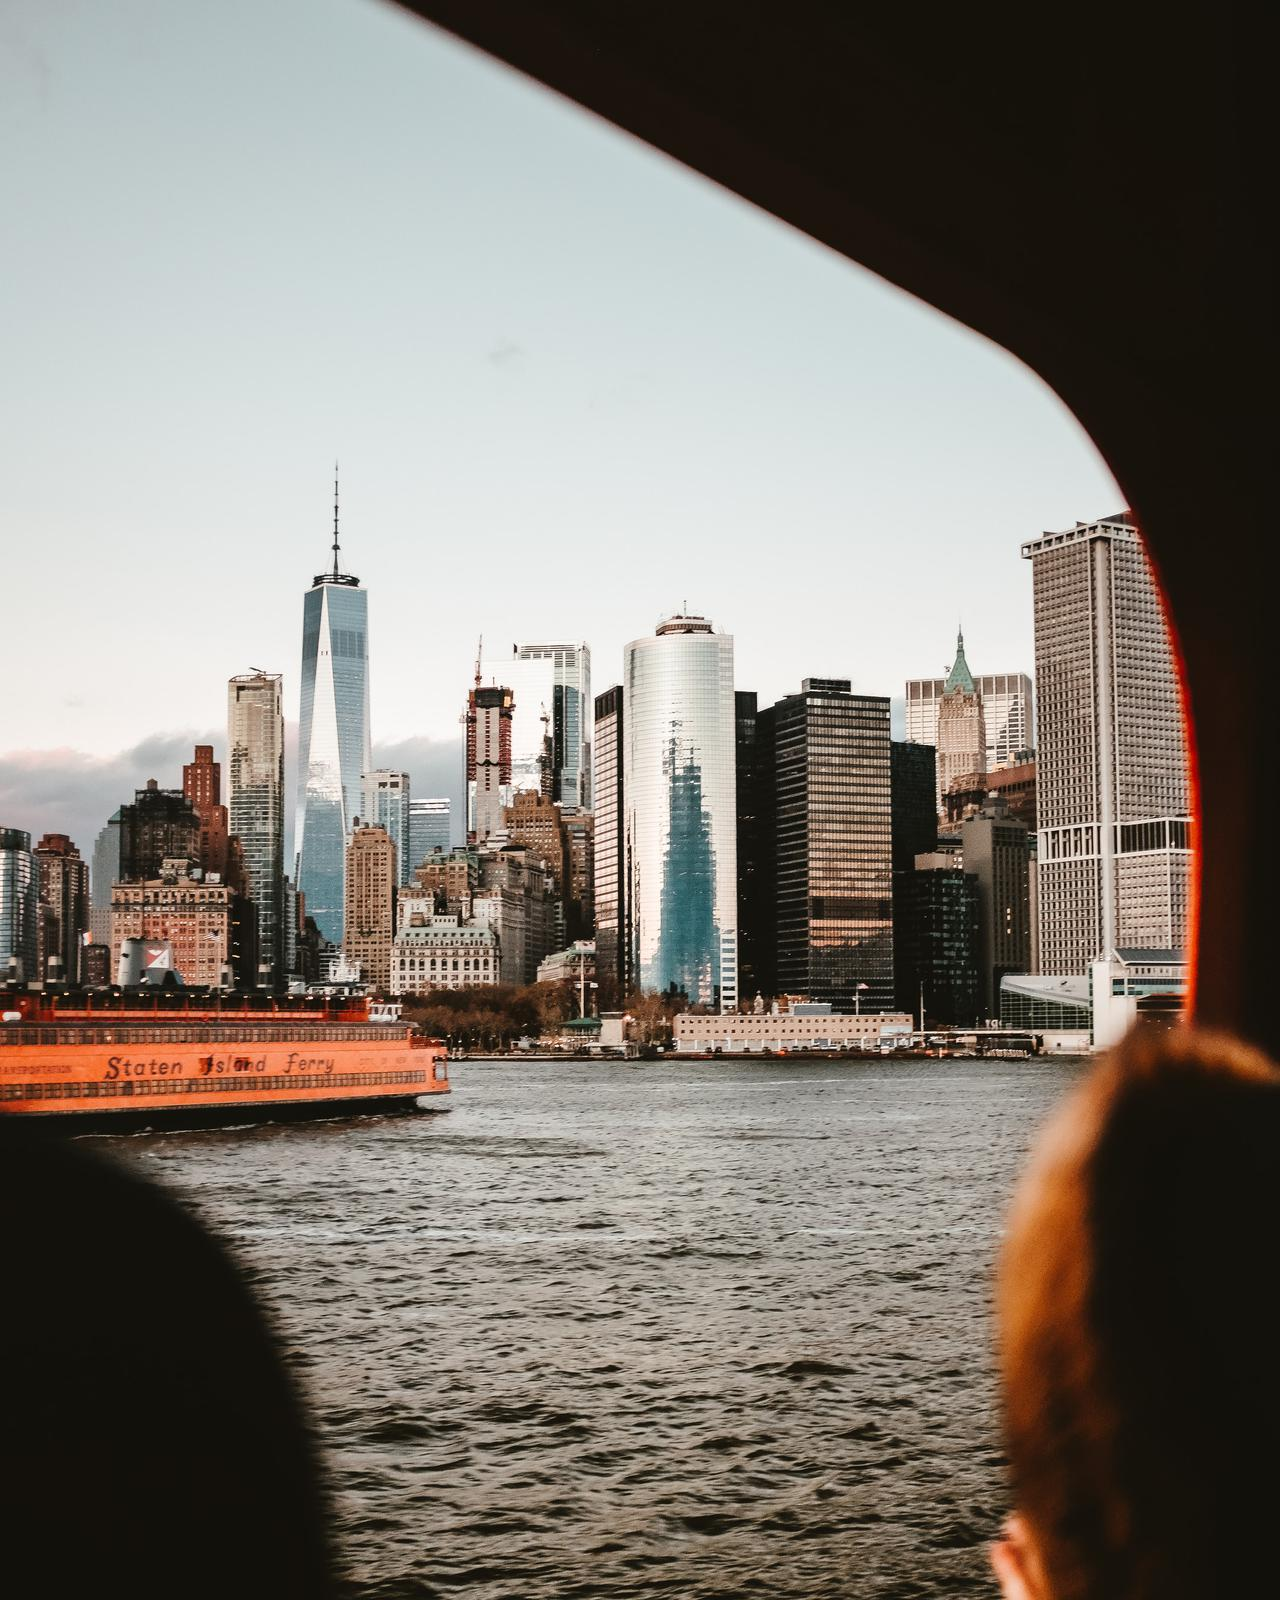 New York Skyline from the Staten Island Ferry